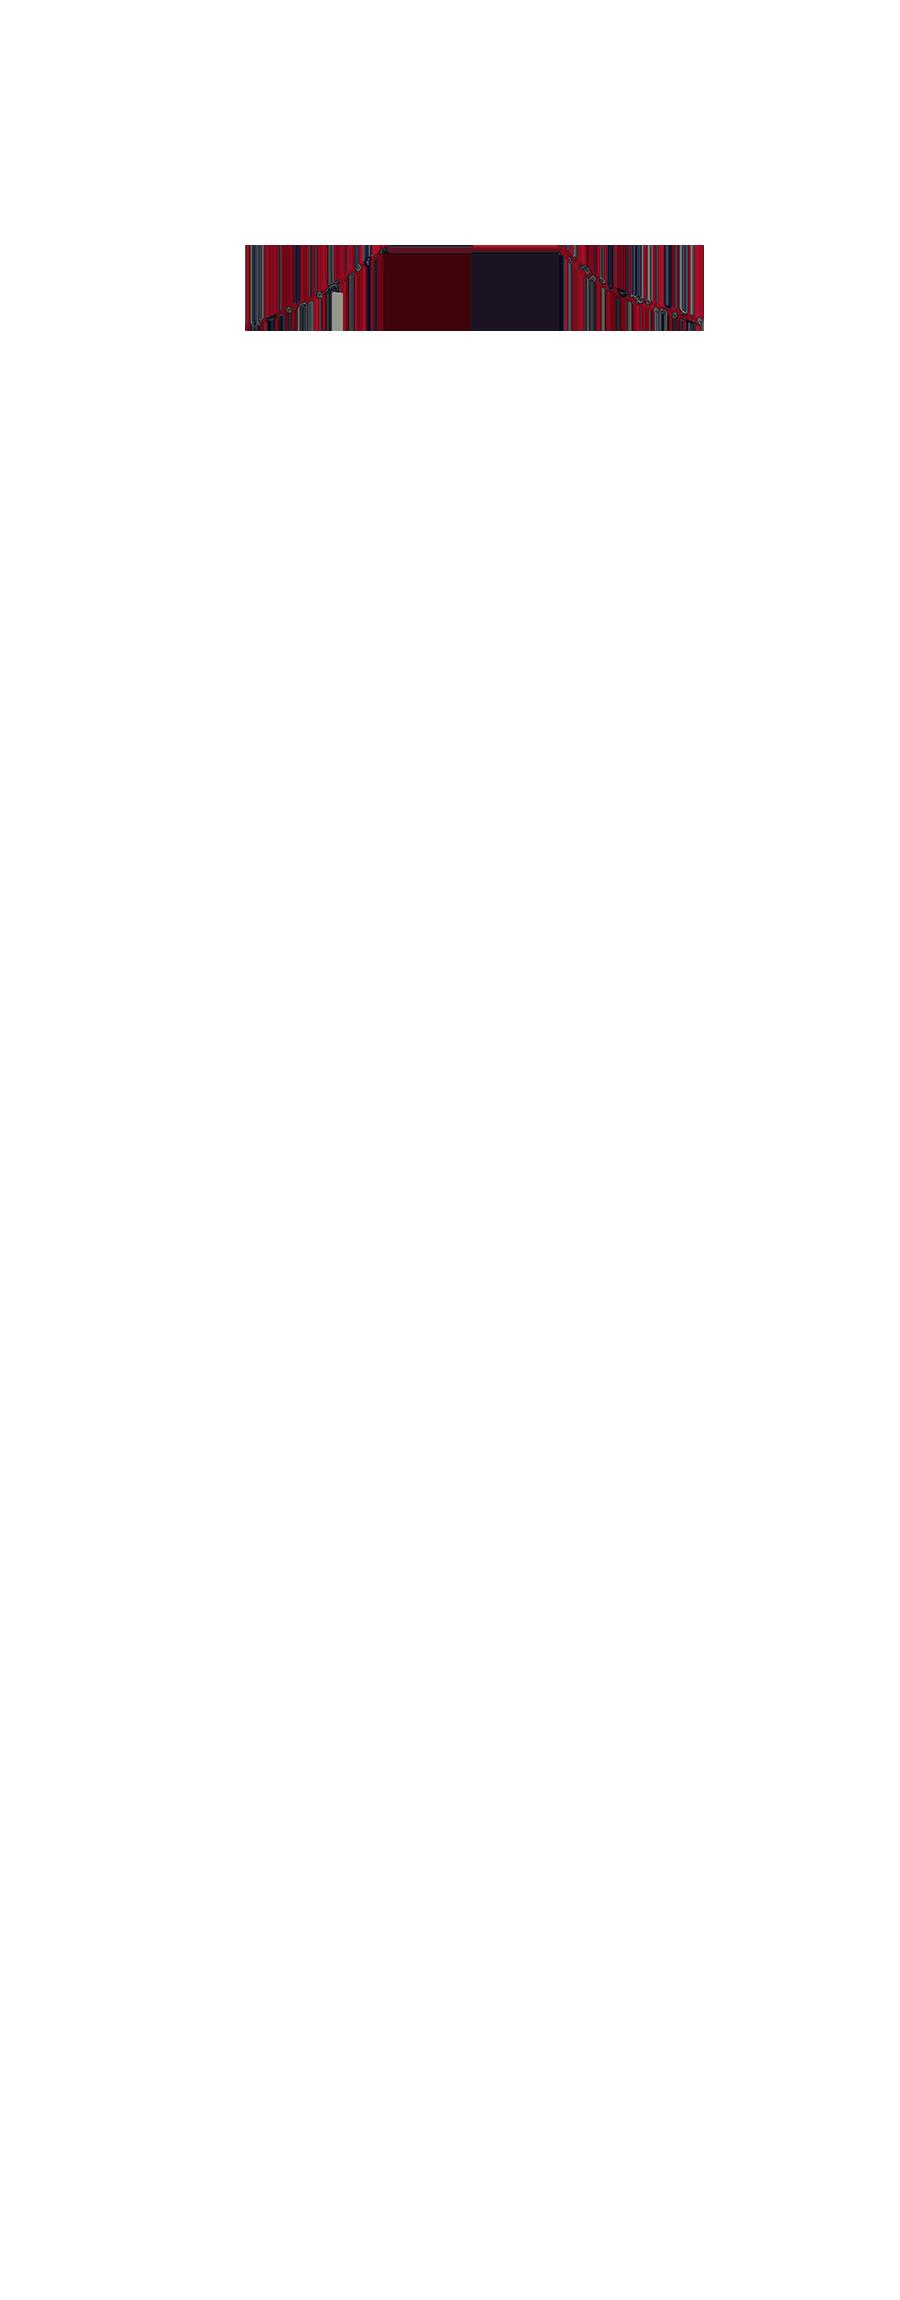 NEFL-17